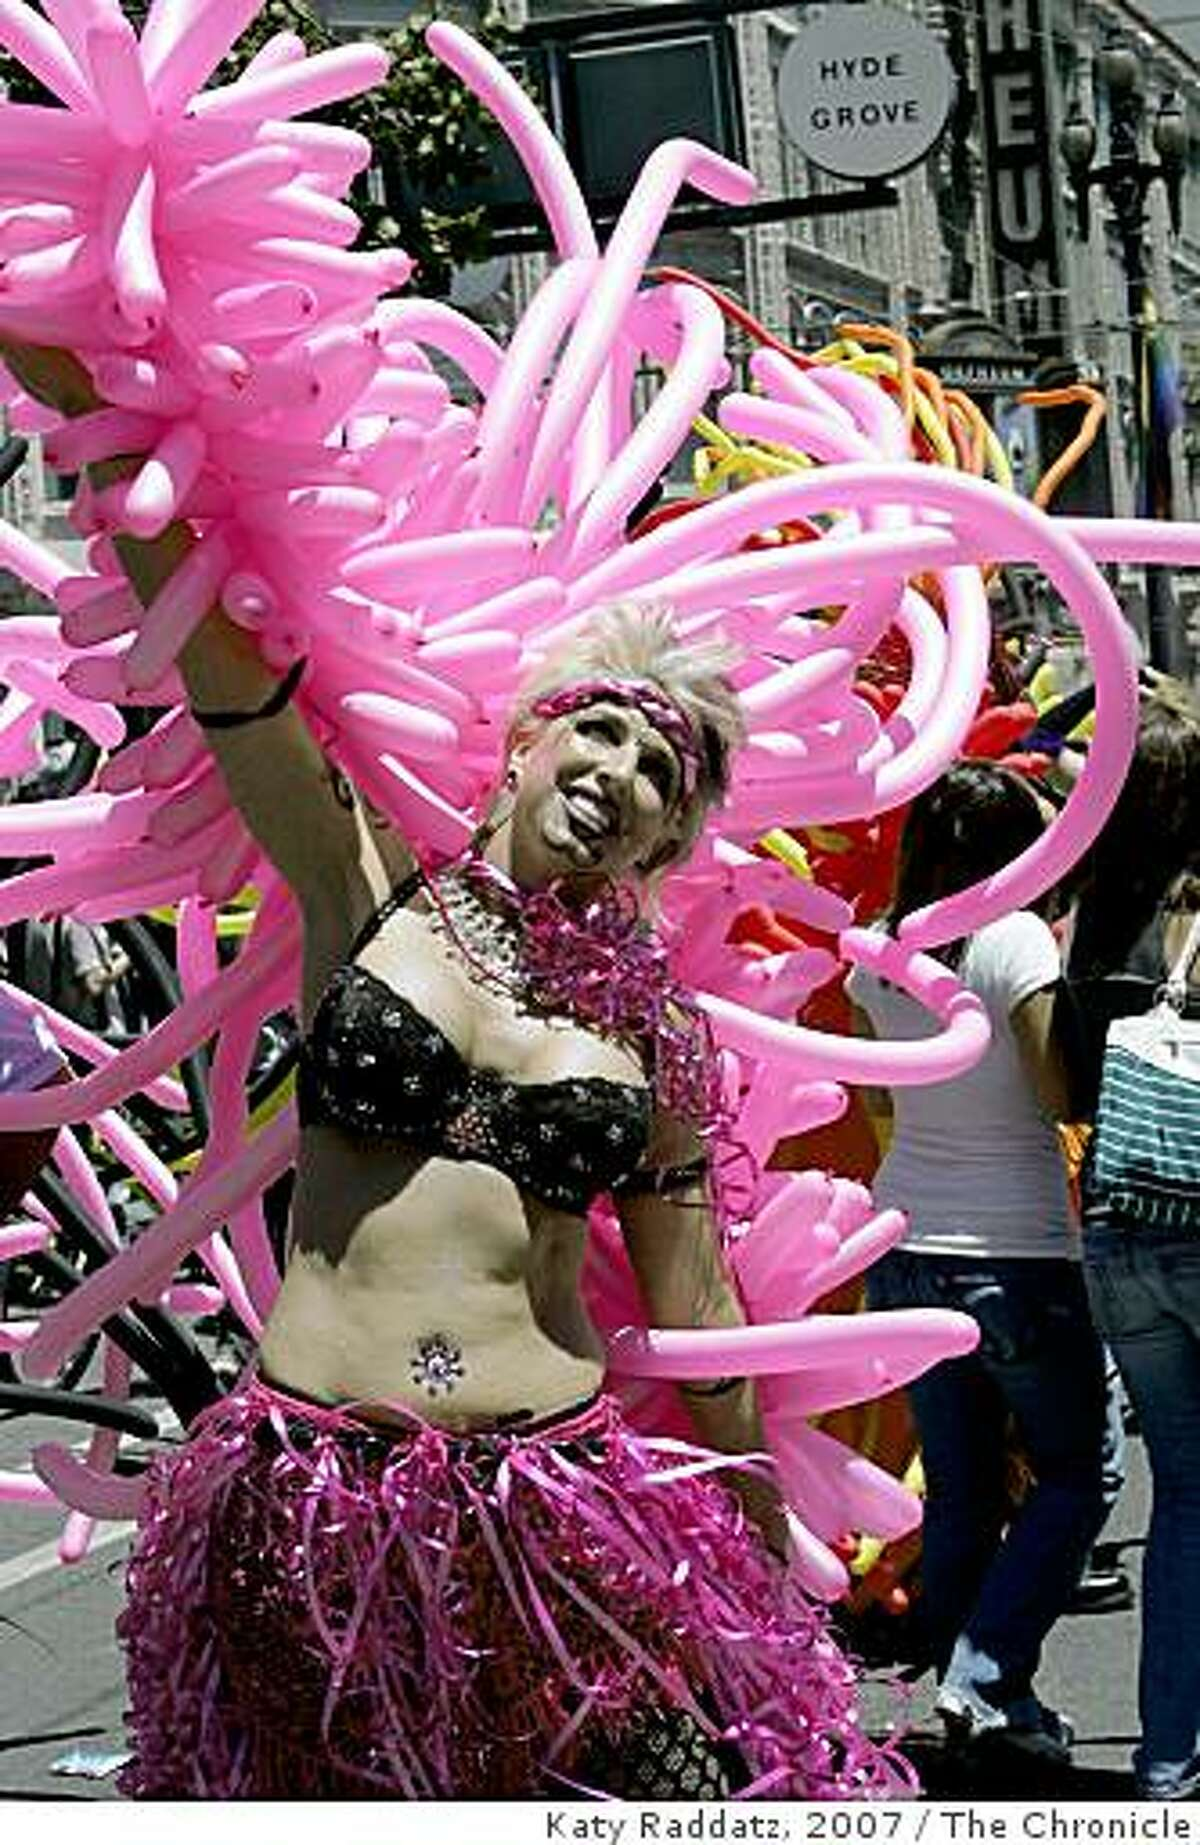 Kimberley Givson participates in the Gay Pride parade Sunday, June 24, 2007, in San Francisco. (AP Photo/The Chronicle, Katy Raddatz) **